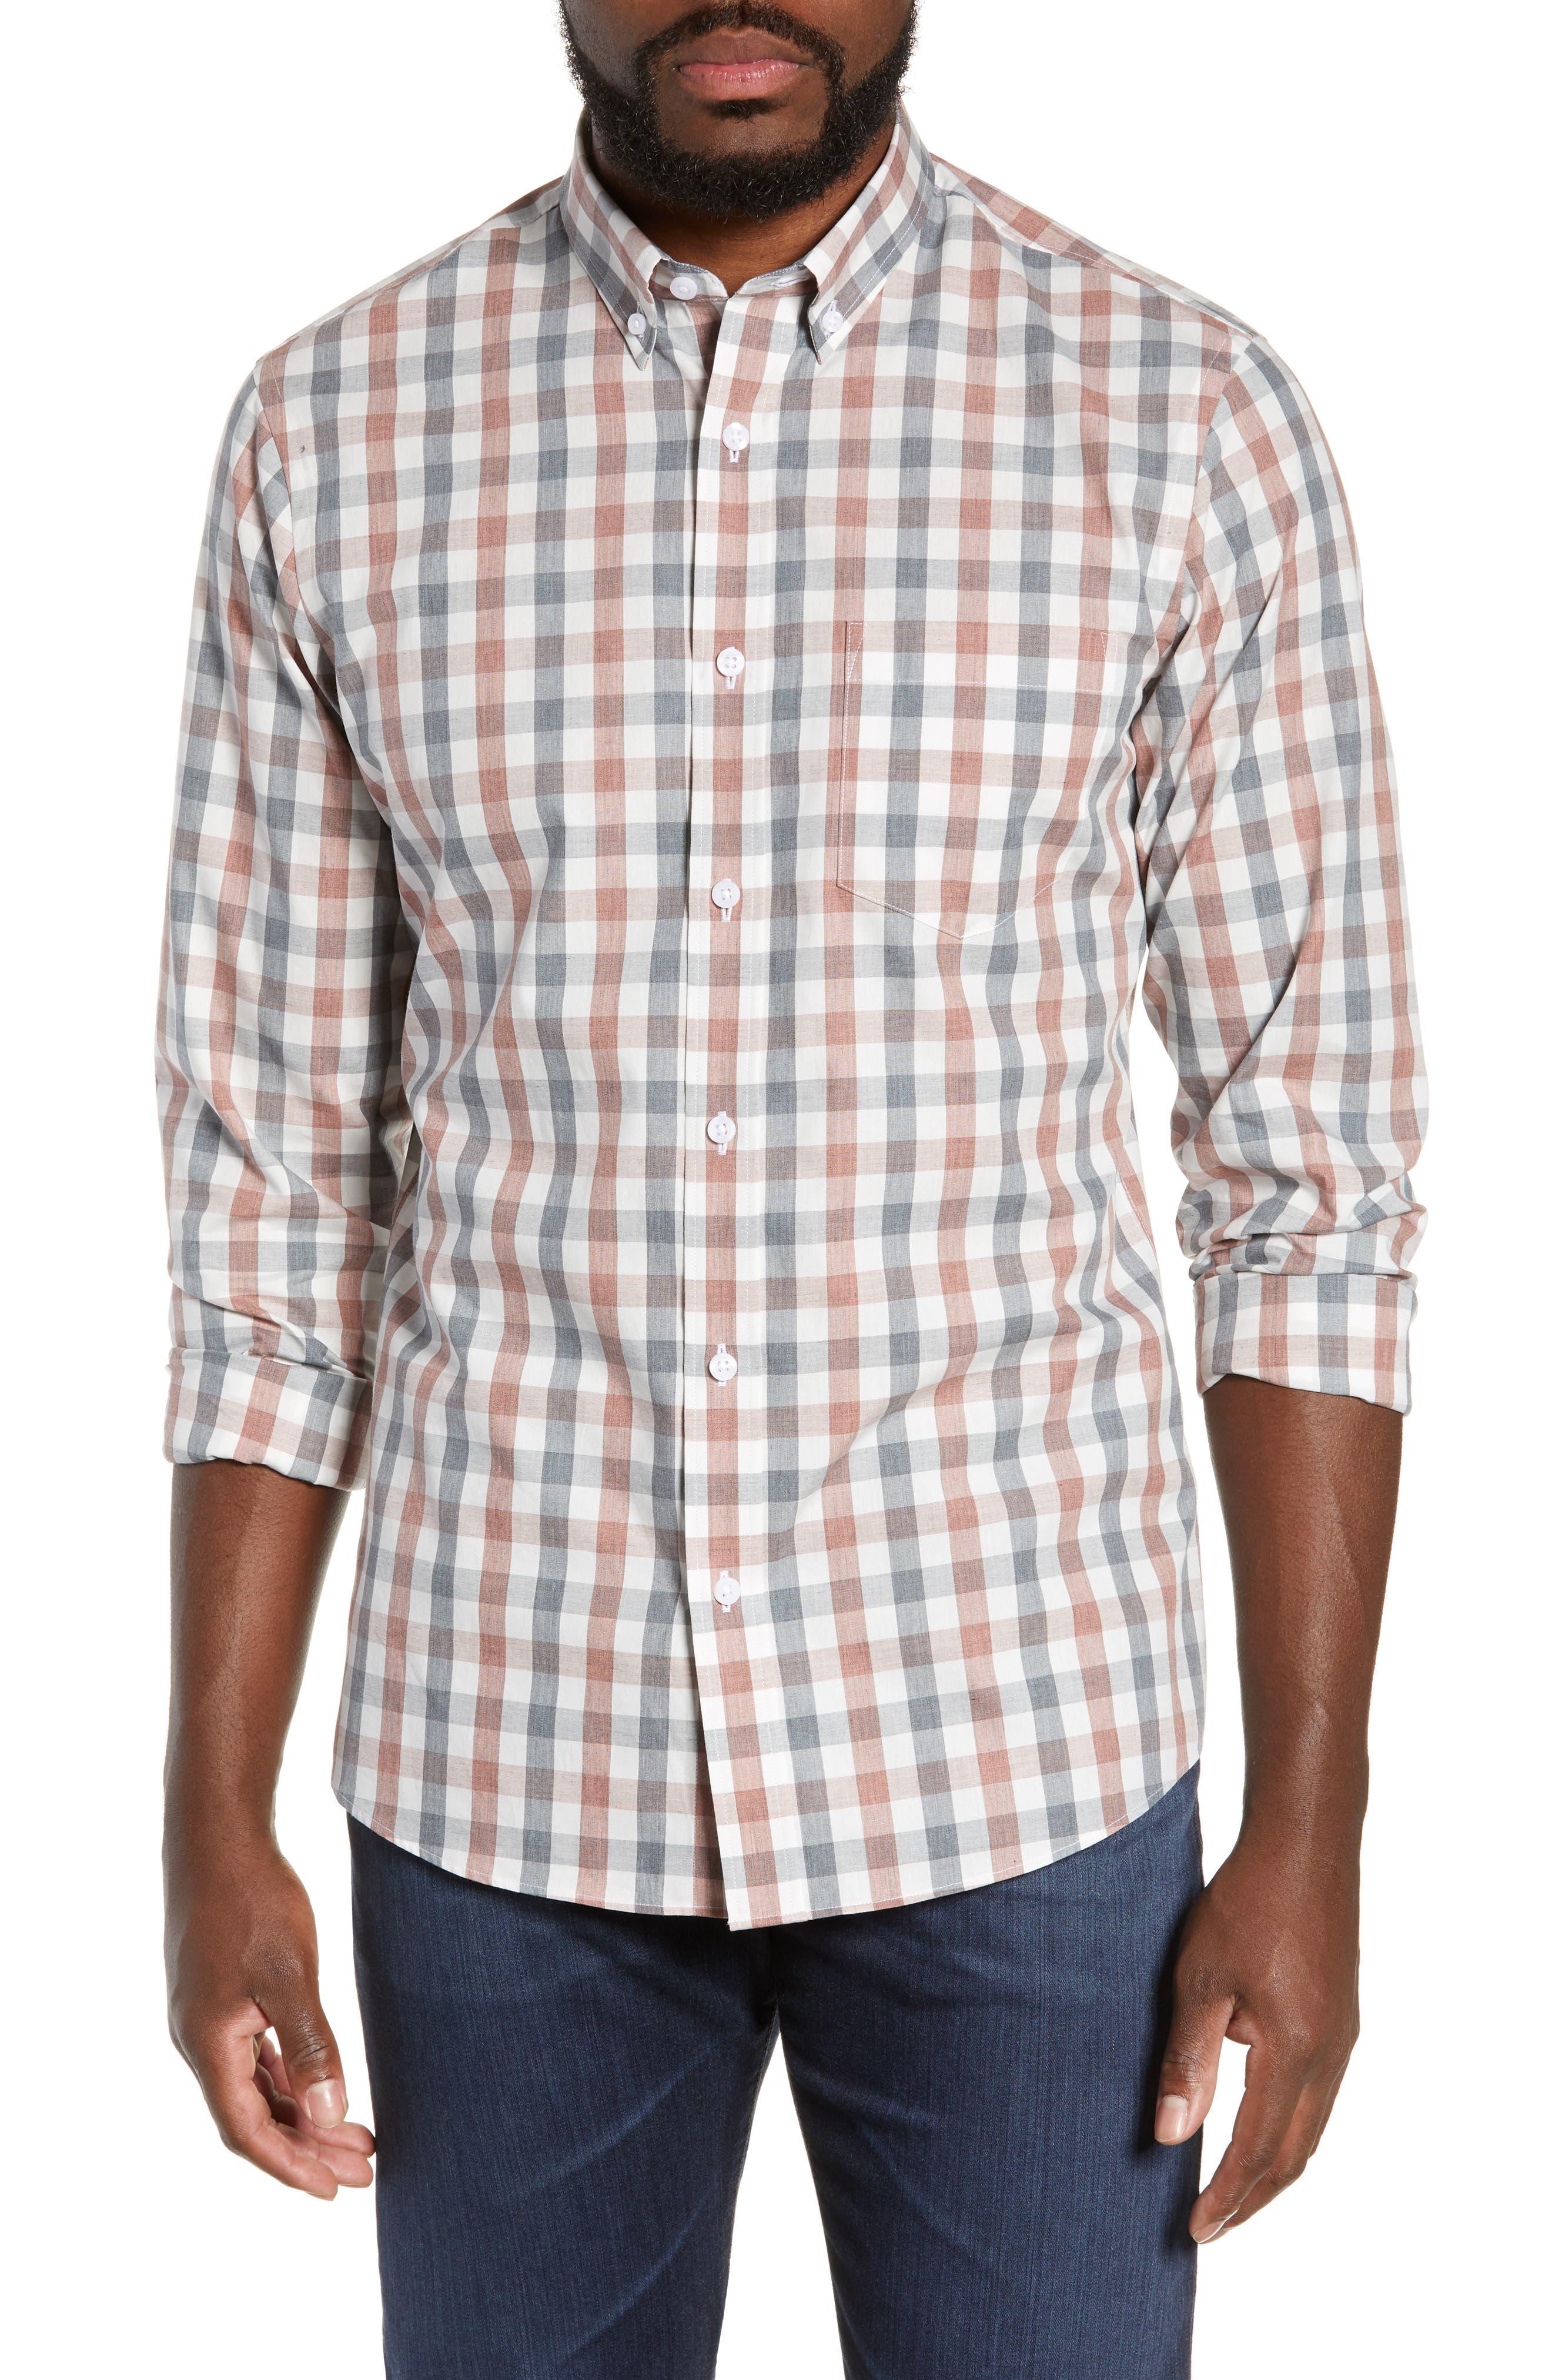 Check Sport Shirt,                             Main thumbnail 1, color,                             GREY RED WHITE MELANGE CHECK